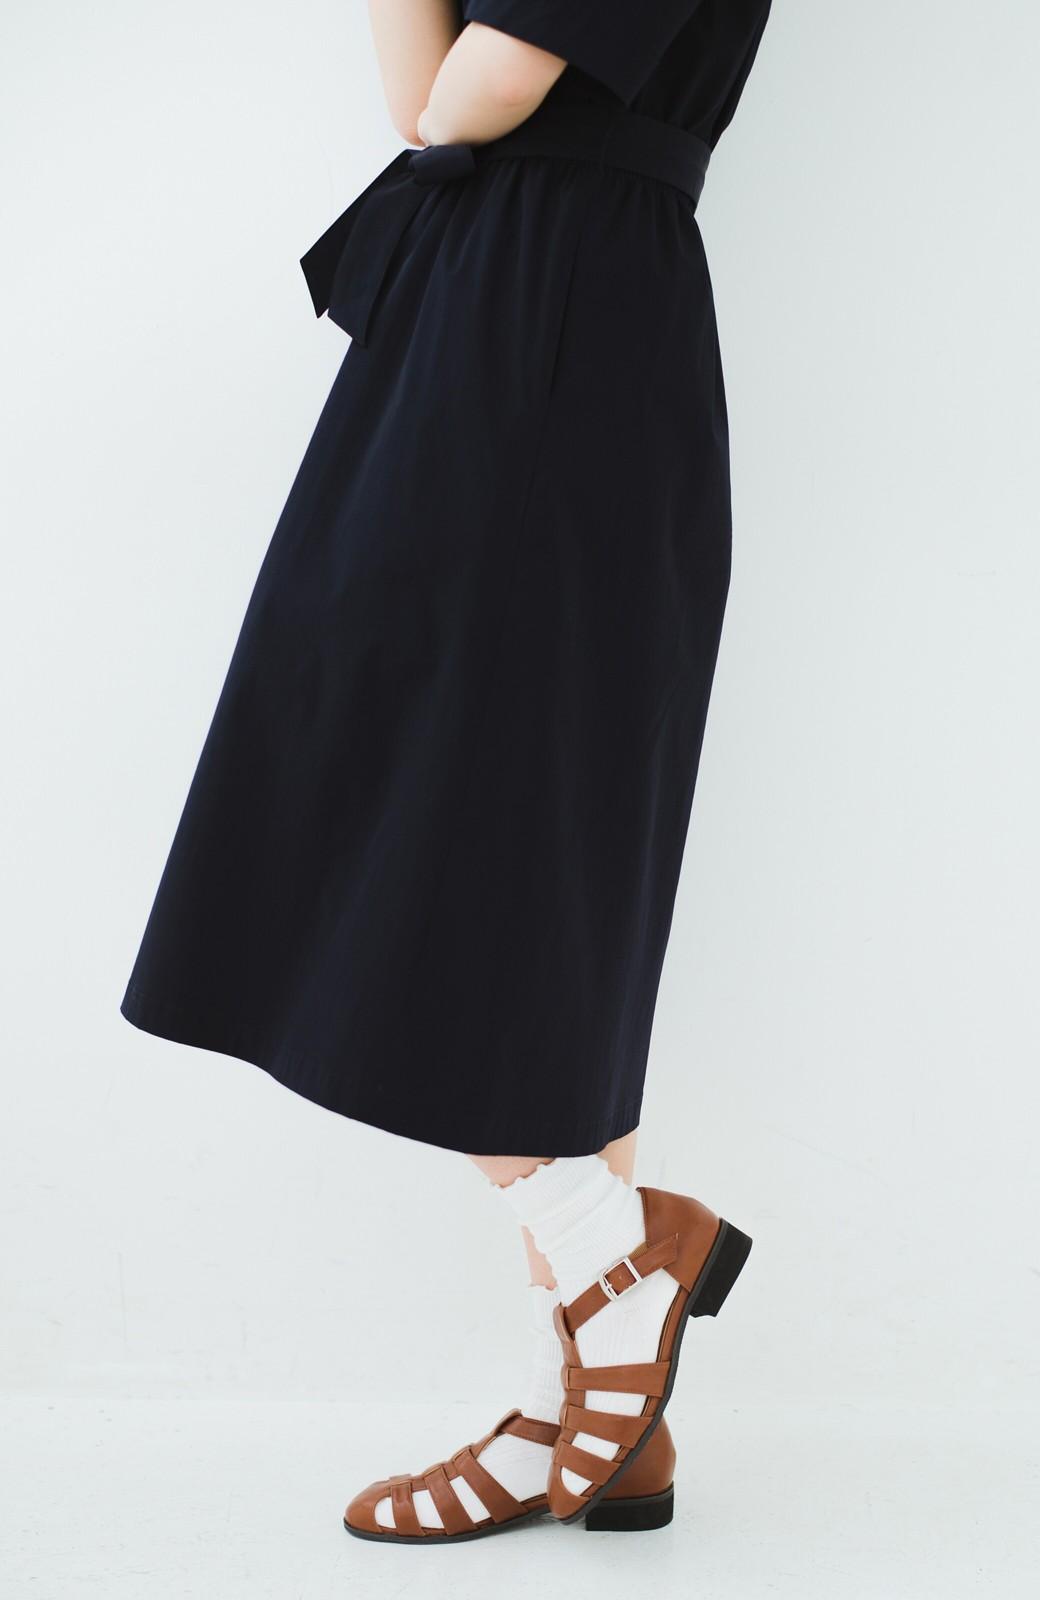 haco! 靴下でも素足でも合う 本革風編み込みサンダル <ブラウン>の商品写真11